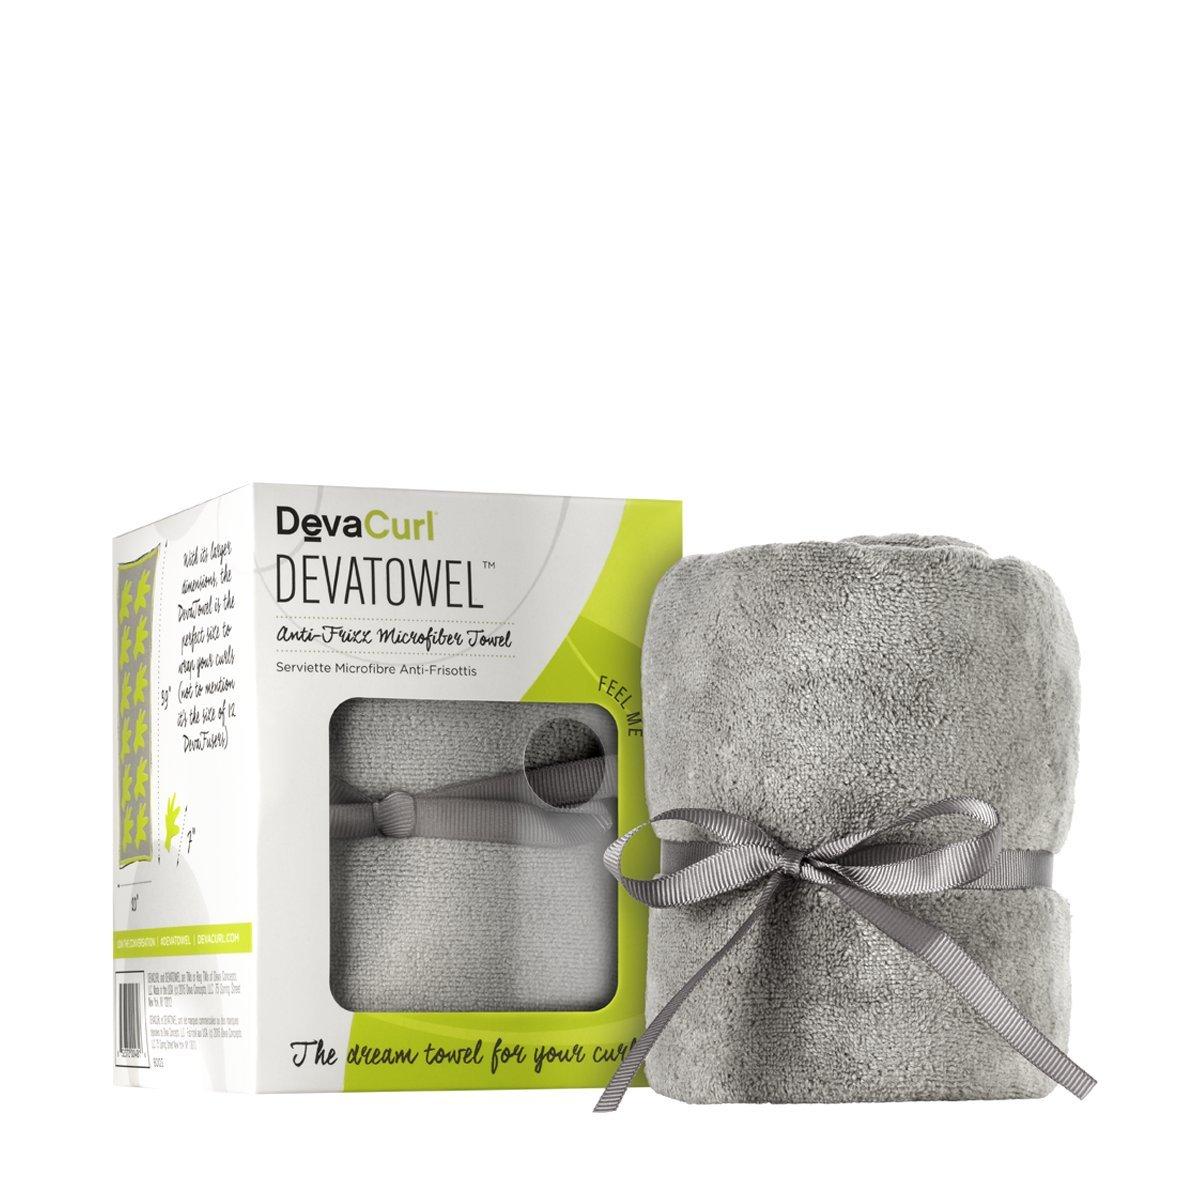 DevaCurl Devacurl Devatowel Anti Frizz Microfiber Towel - New DevaConcepts 8003